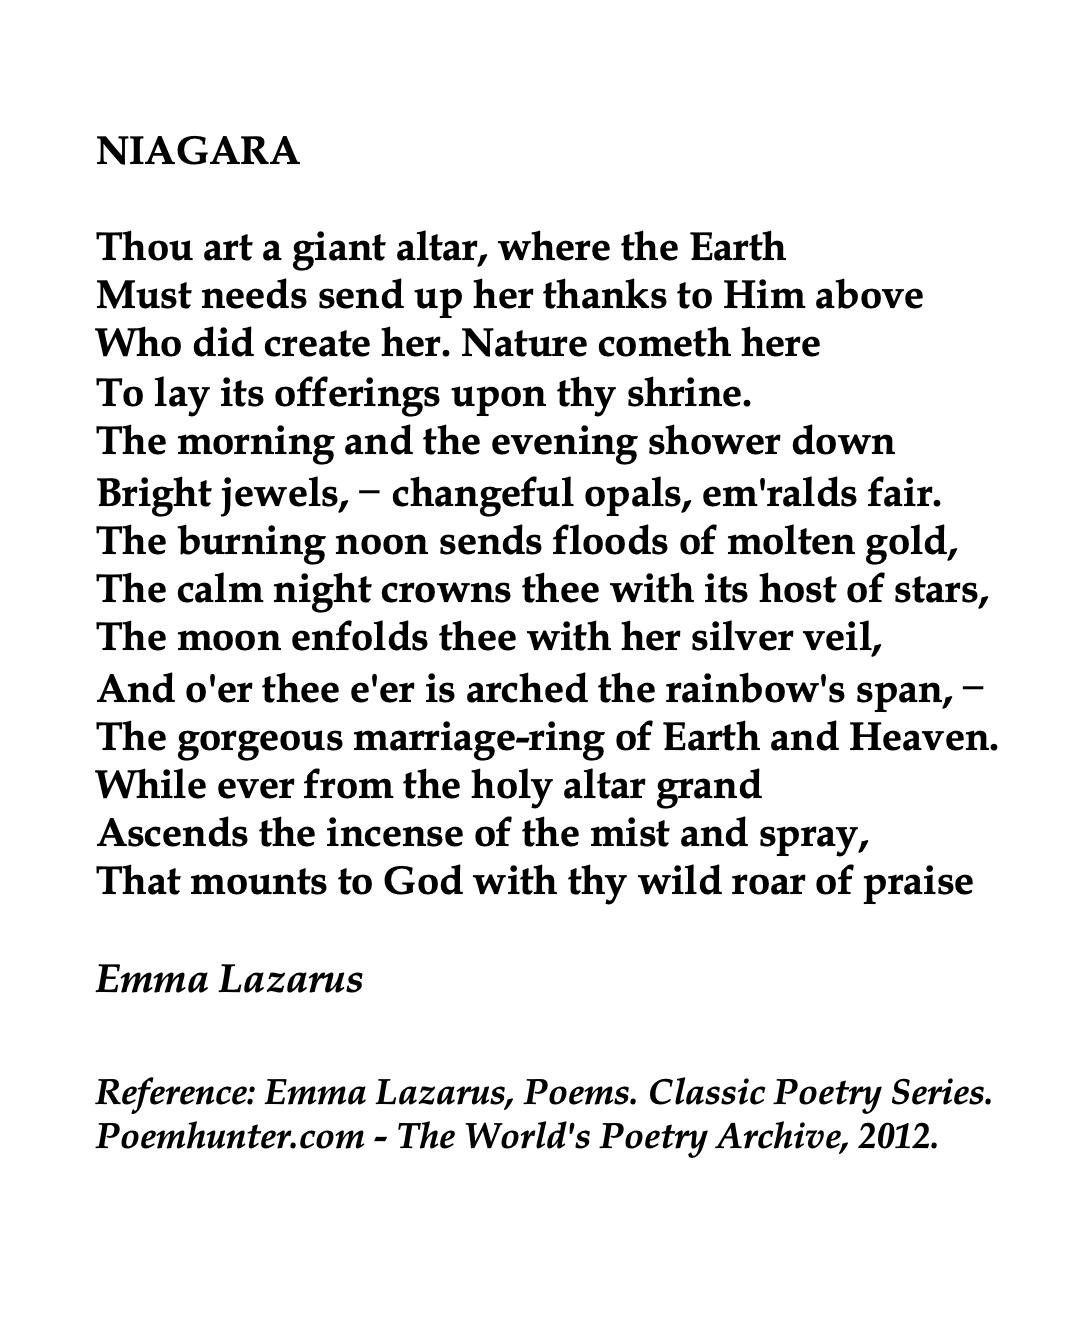 Emma Lazarus Poems Classic Poetry Series Poemhuntercom